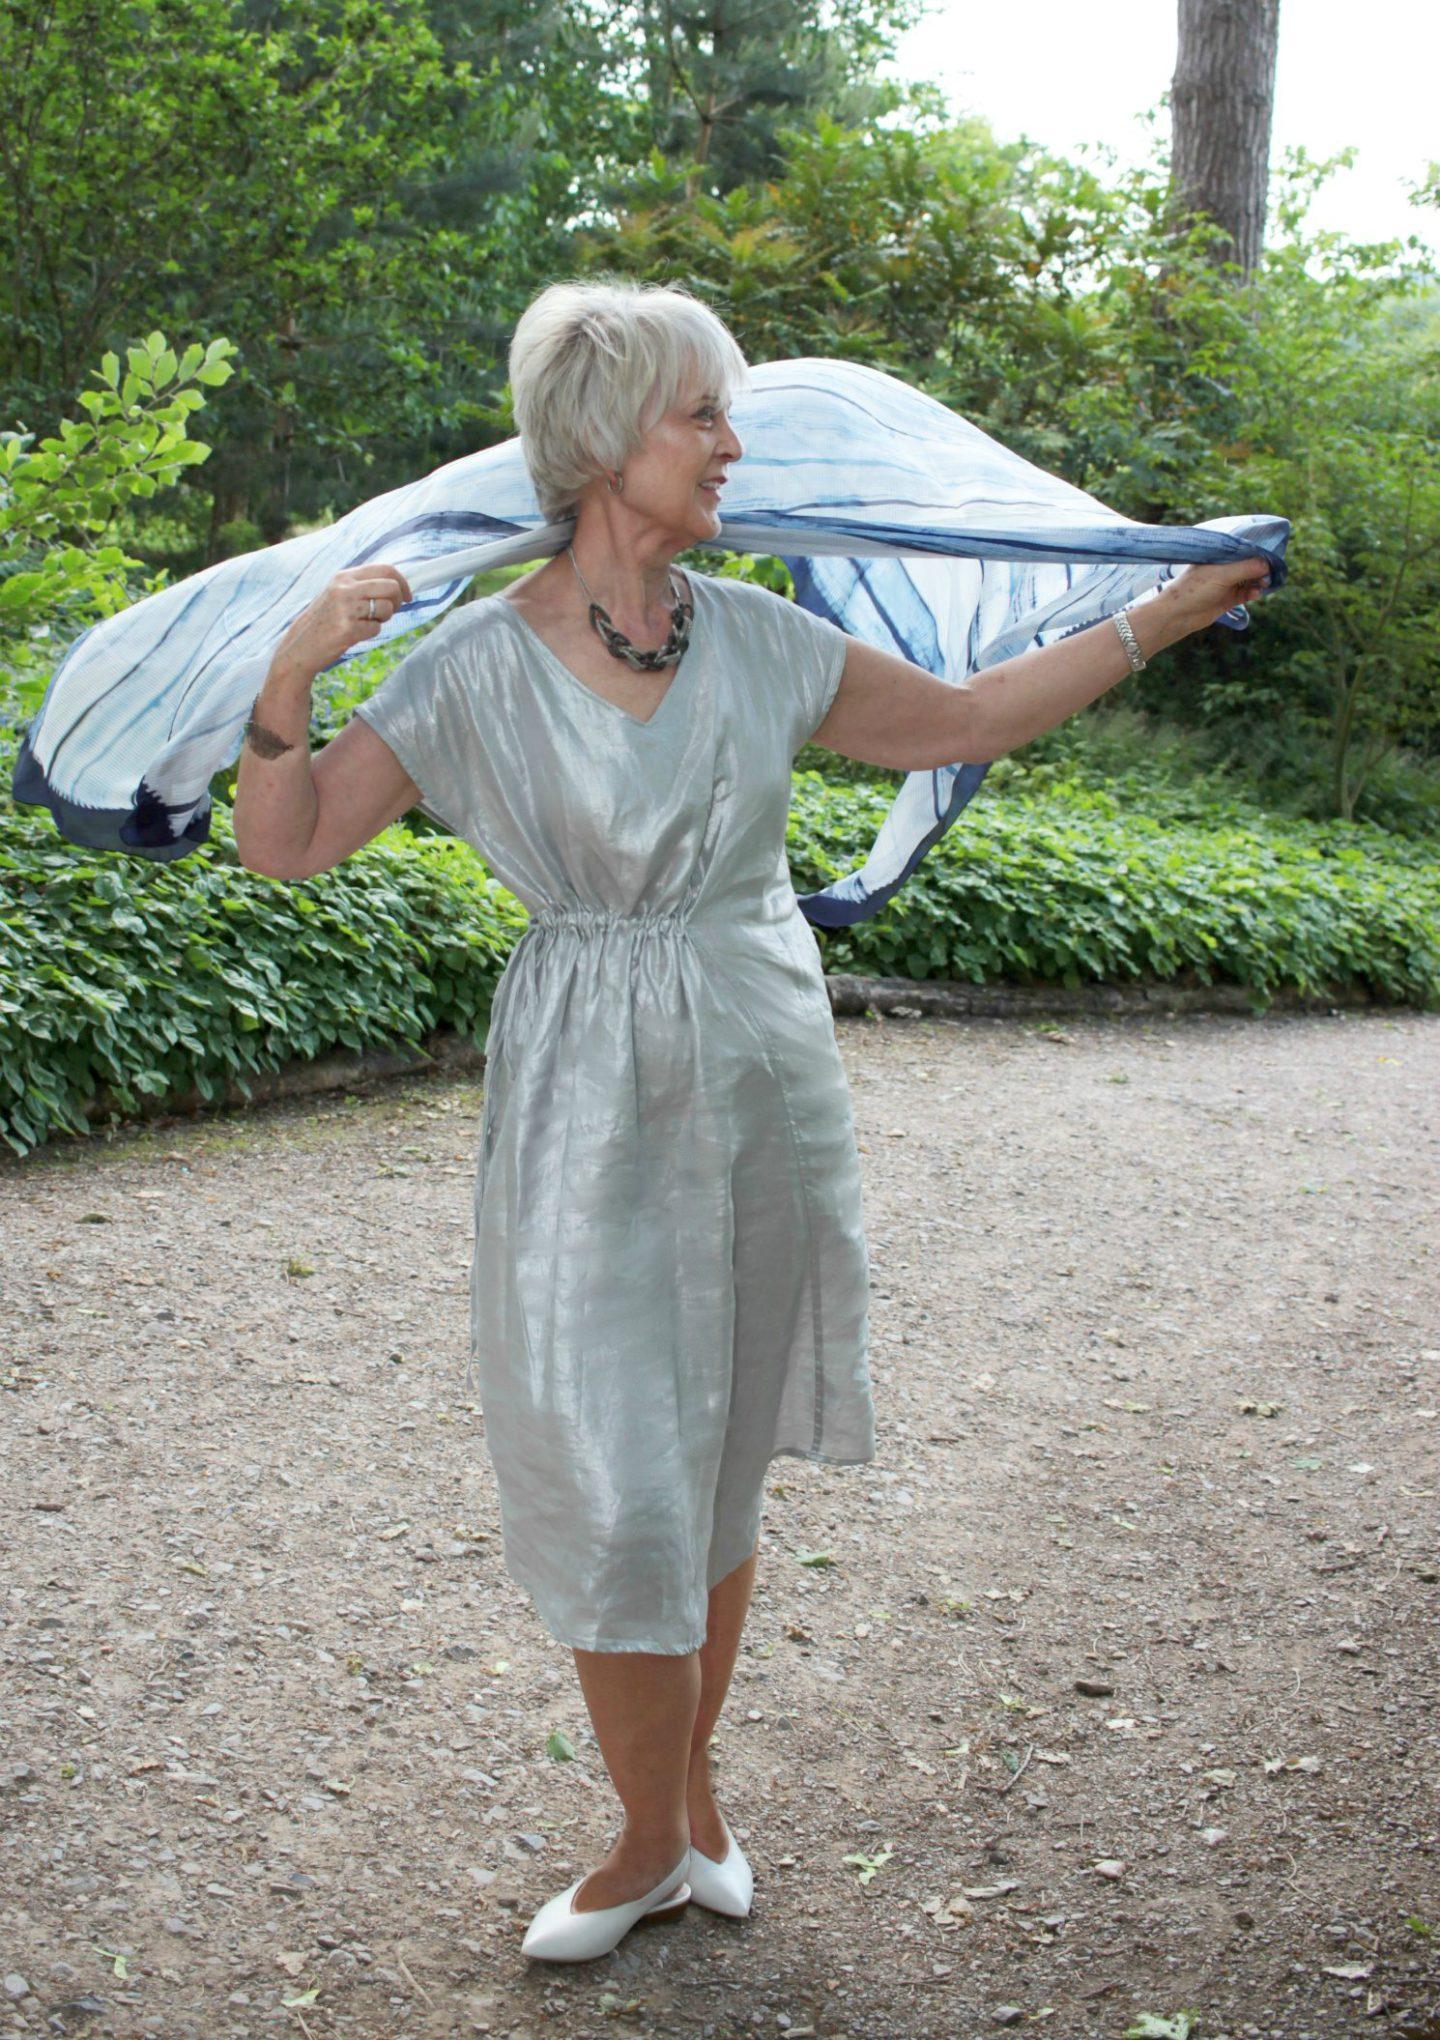 Sparkling summer dress